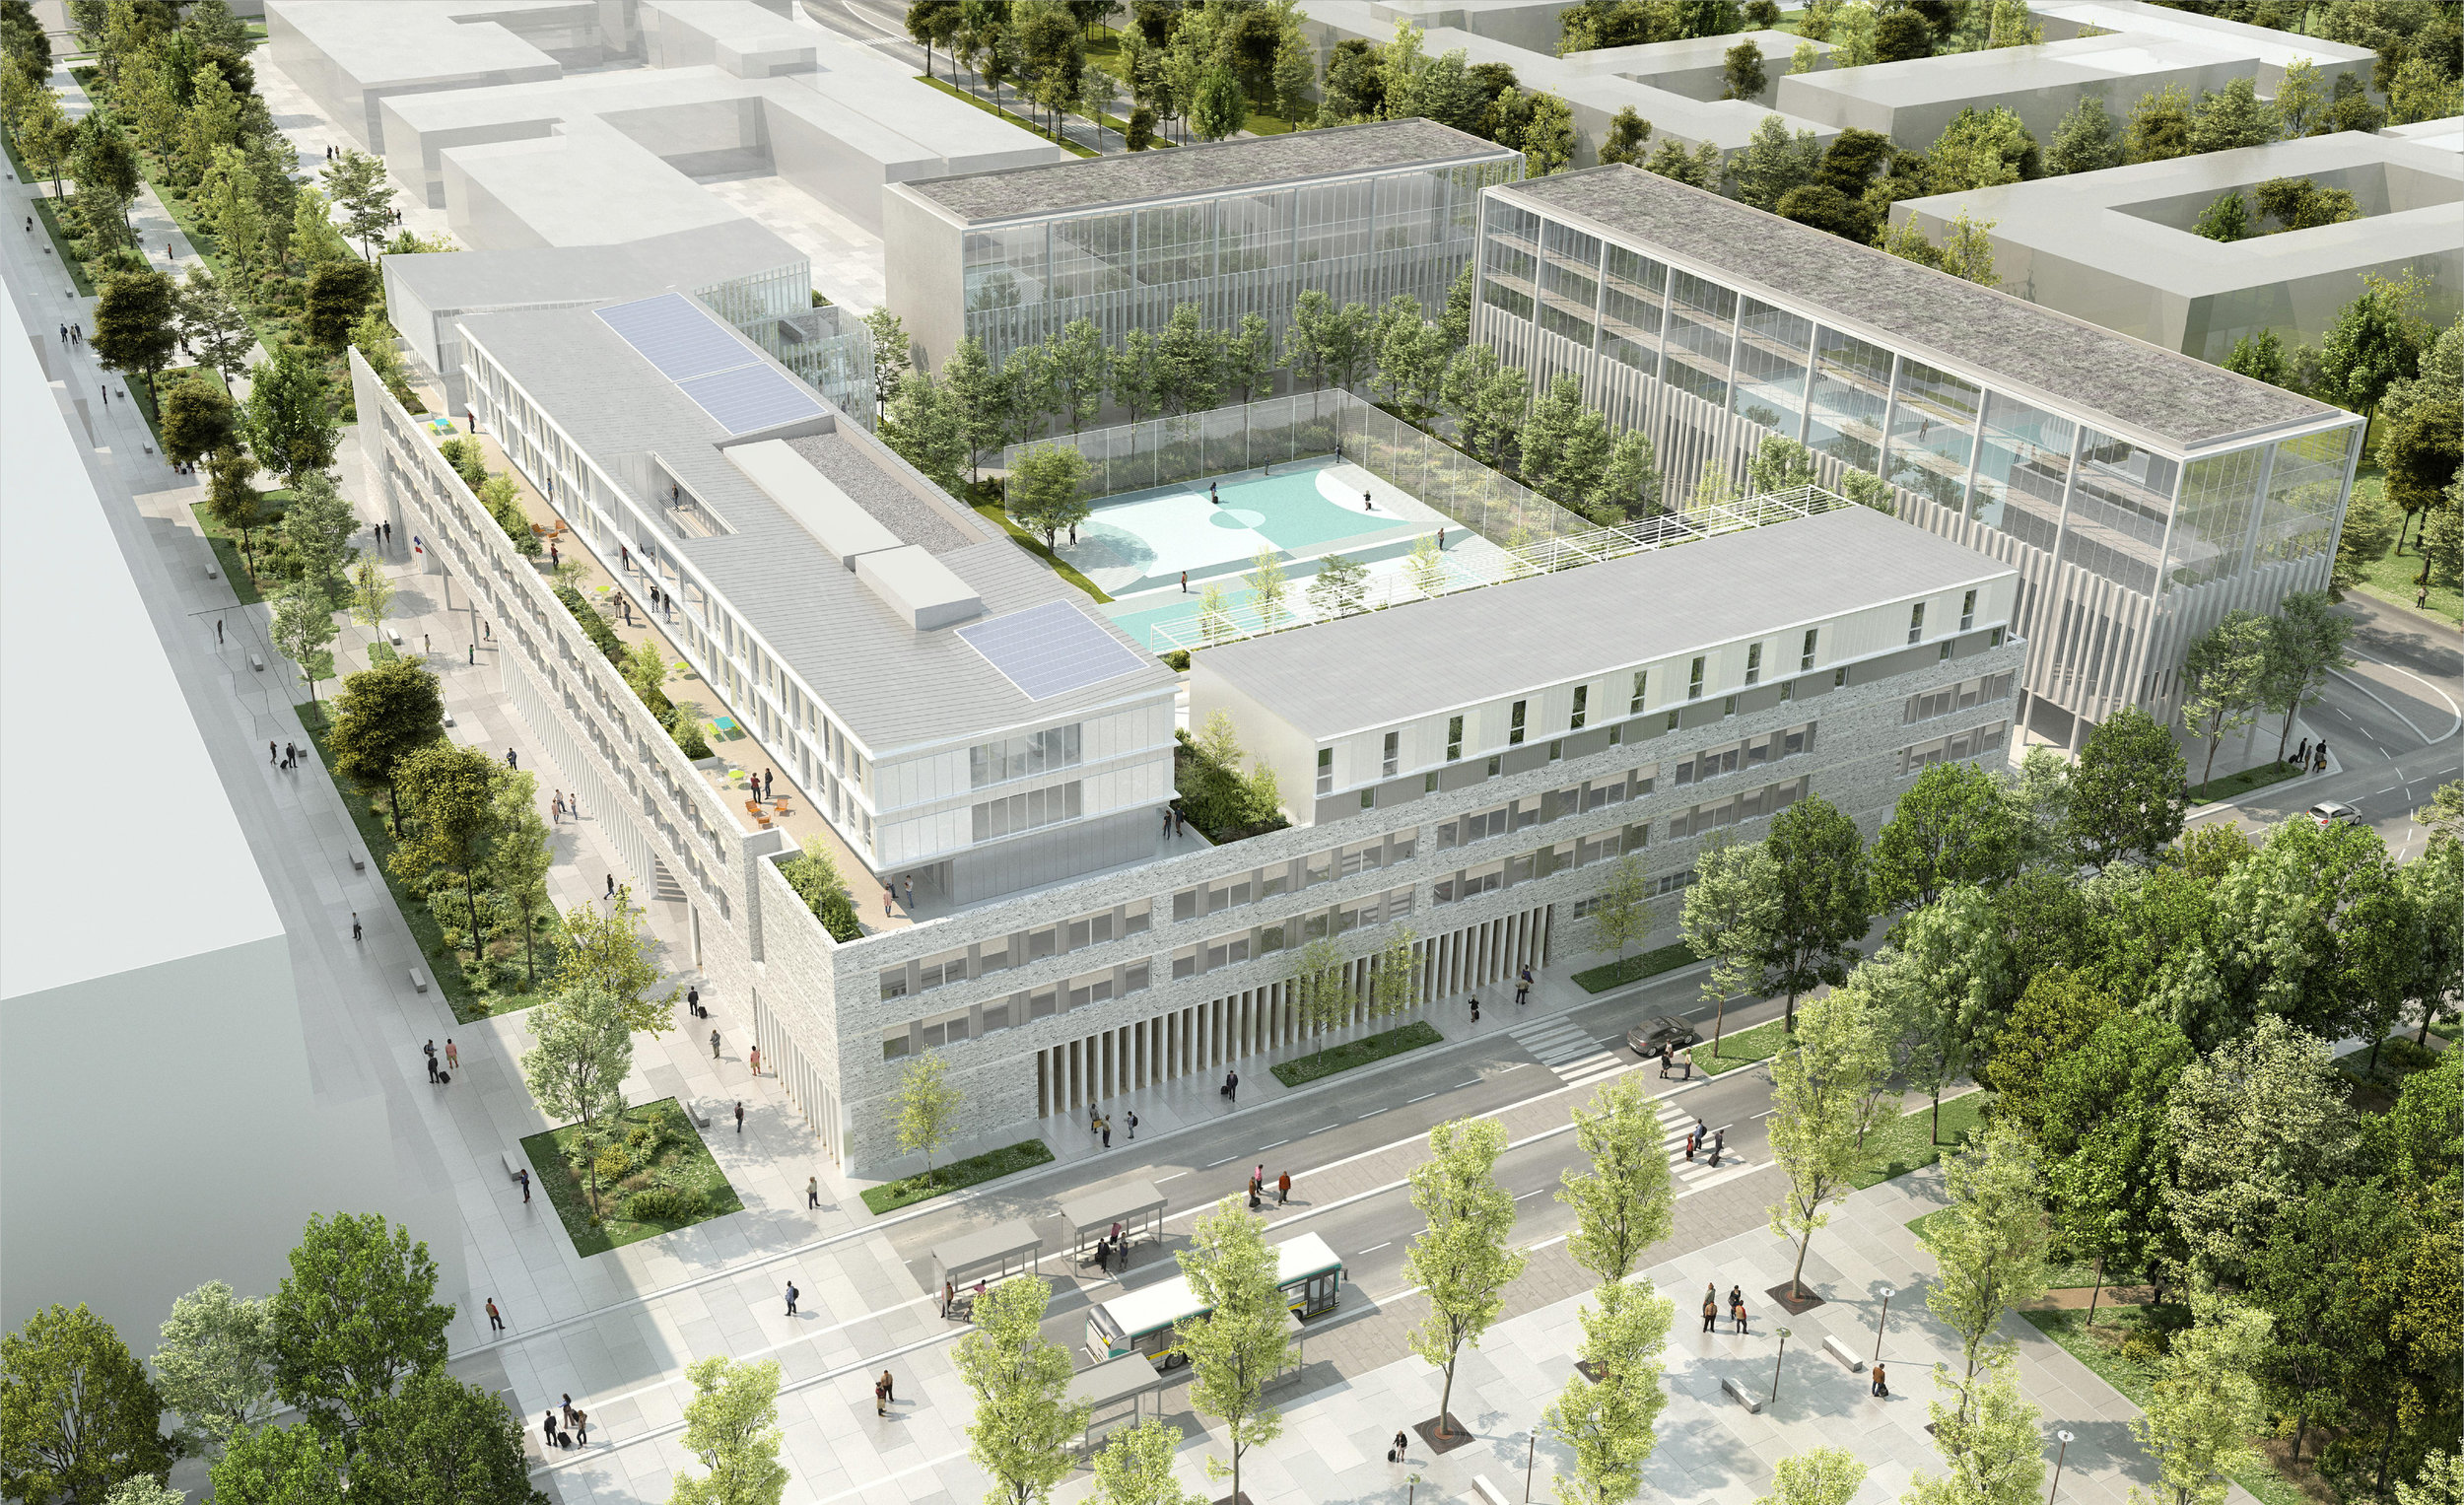 lycée_palaiseau_public_outdoor_design_christophe_gautrand_paysagiste_2.jpg